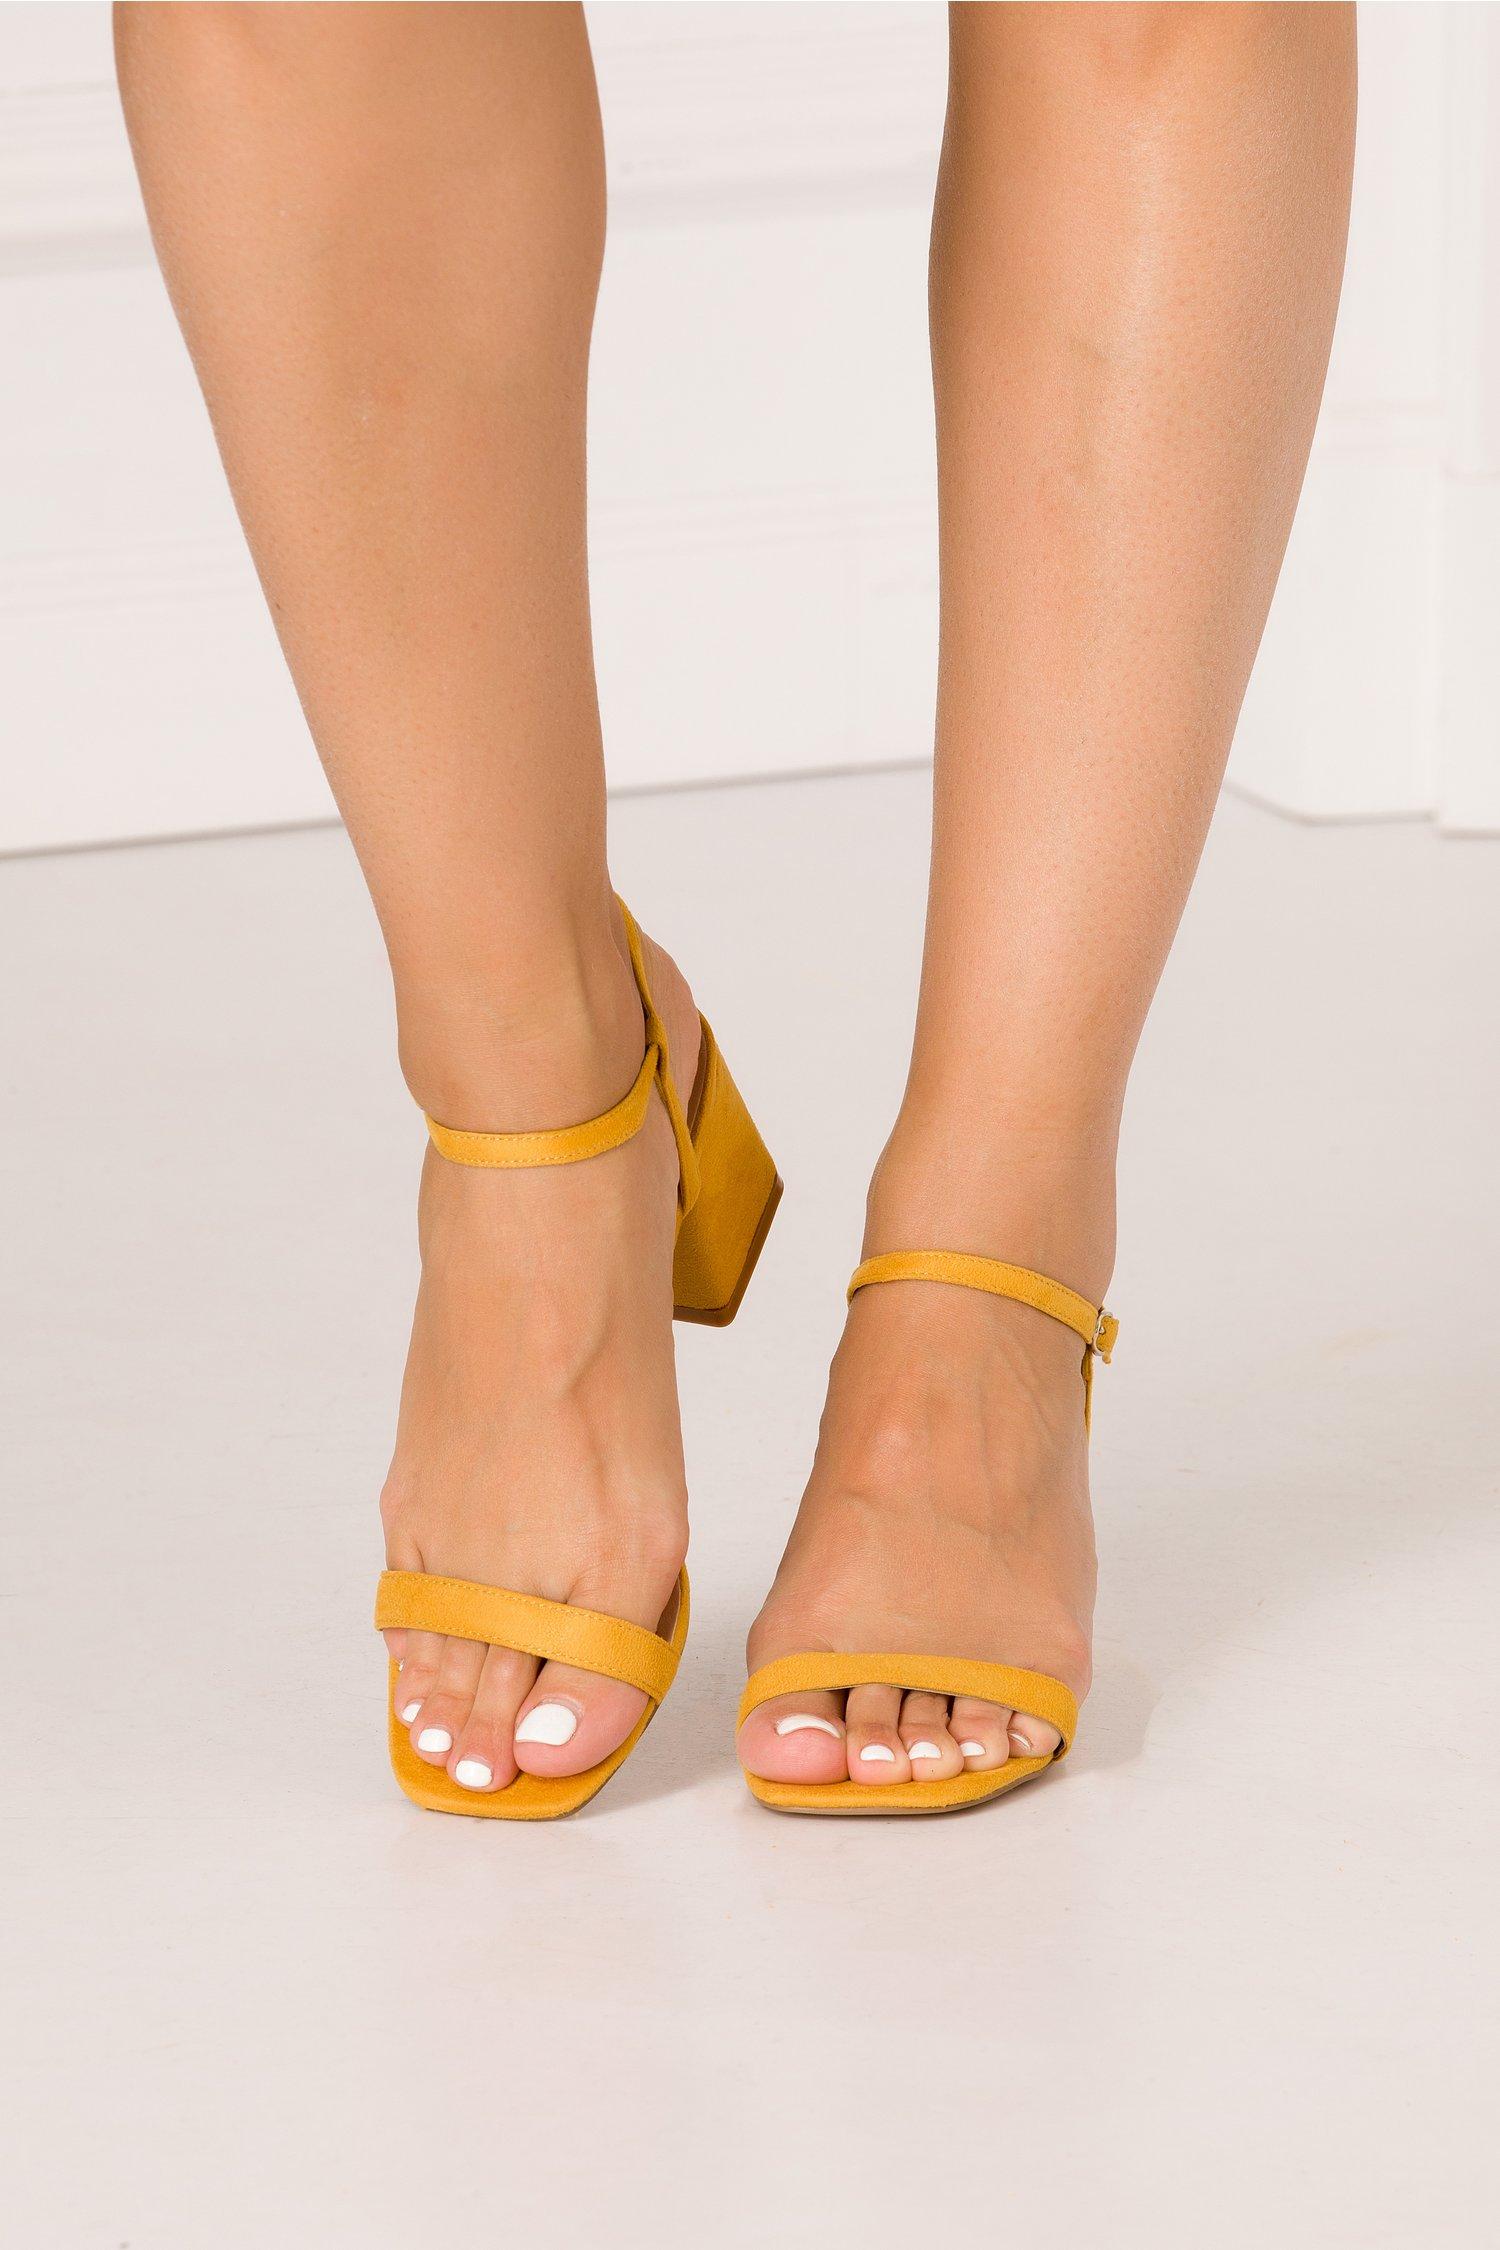 Sandale galbene cu barete fine